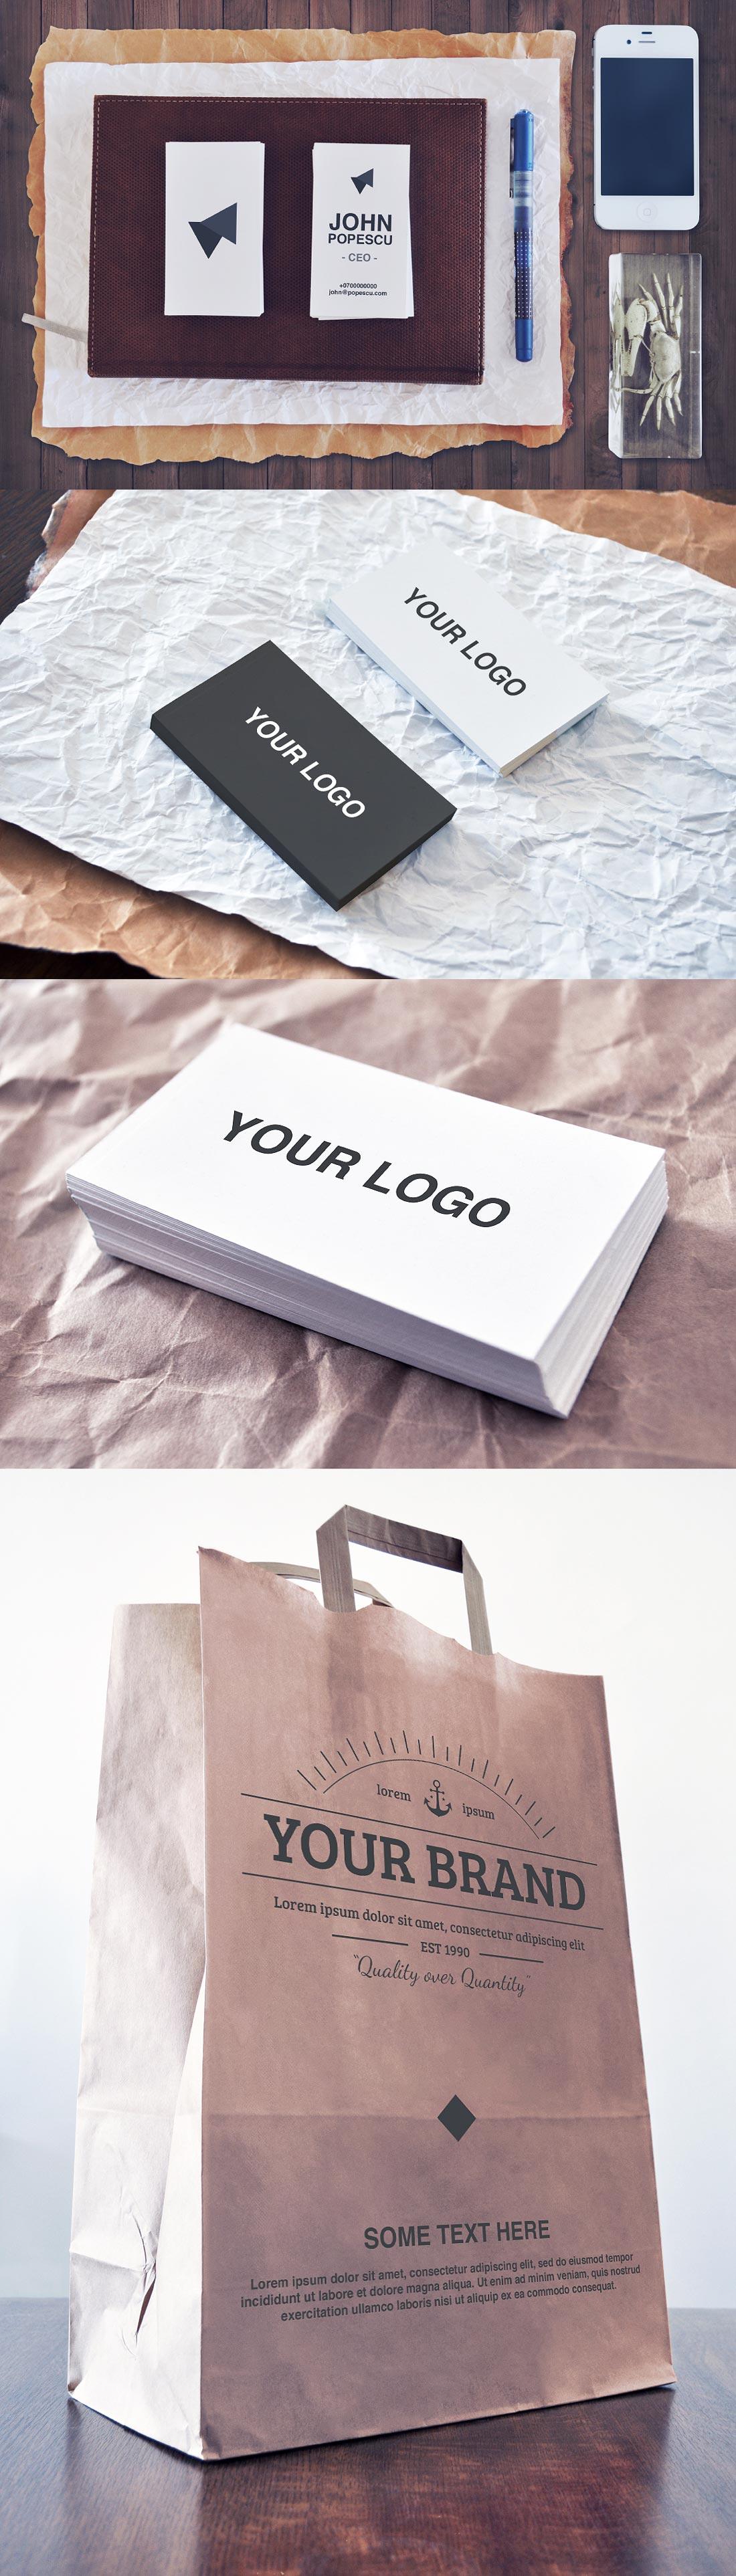 11--branding-mockup-set